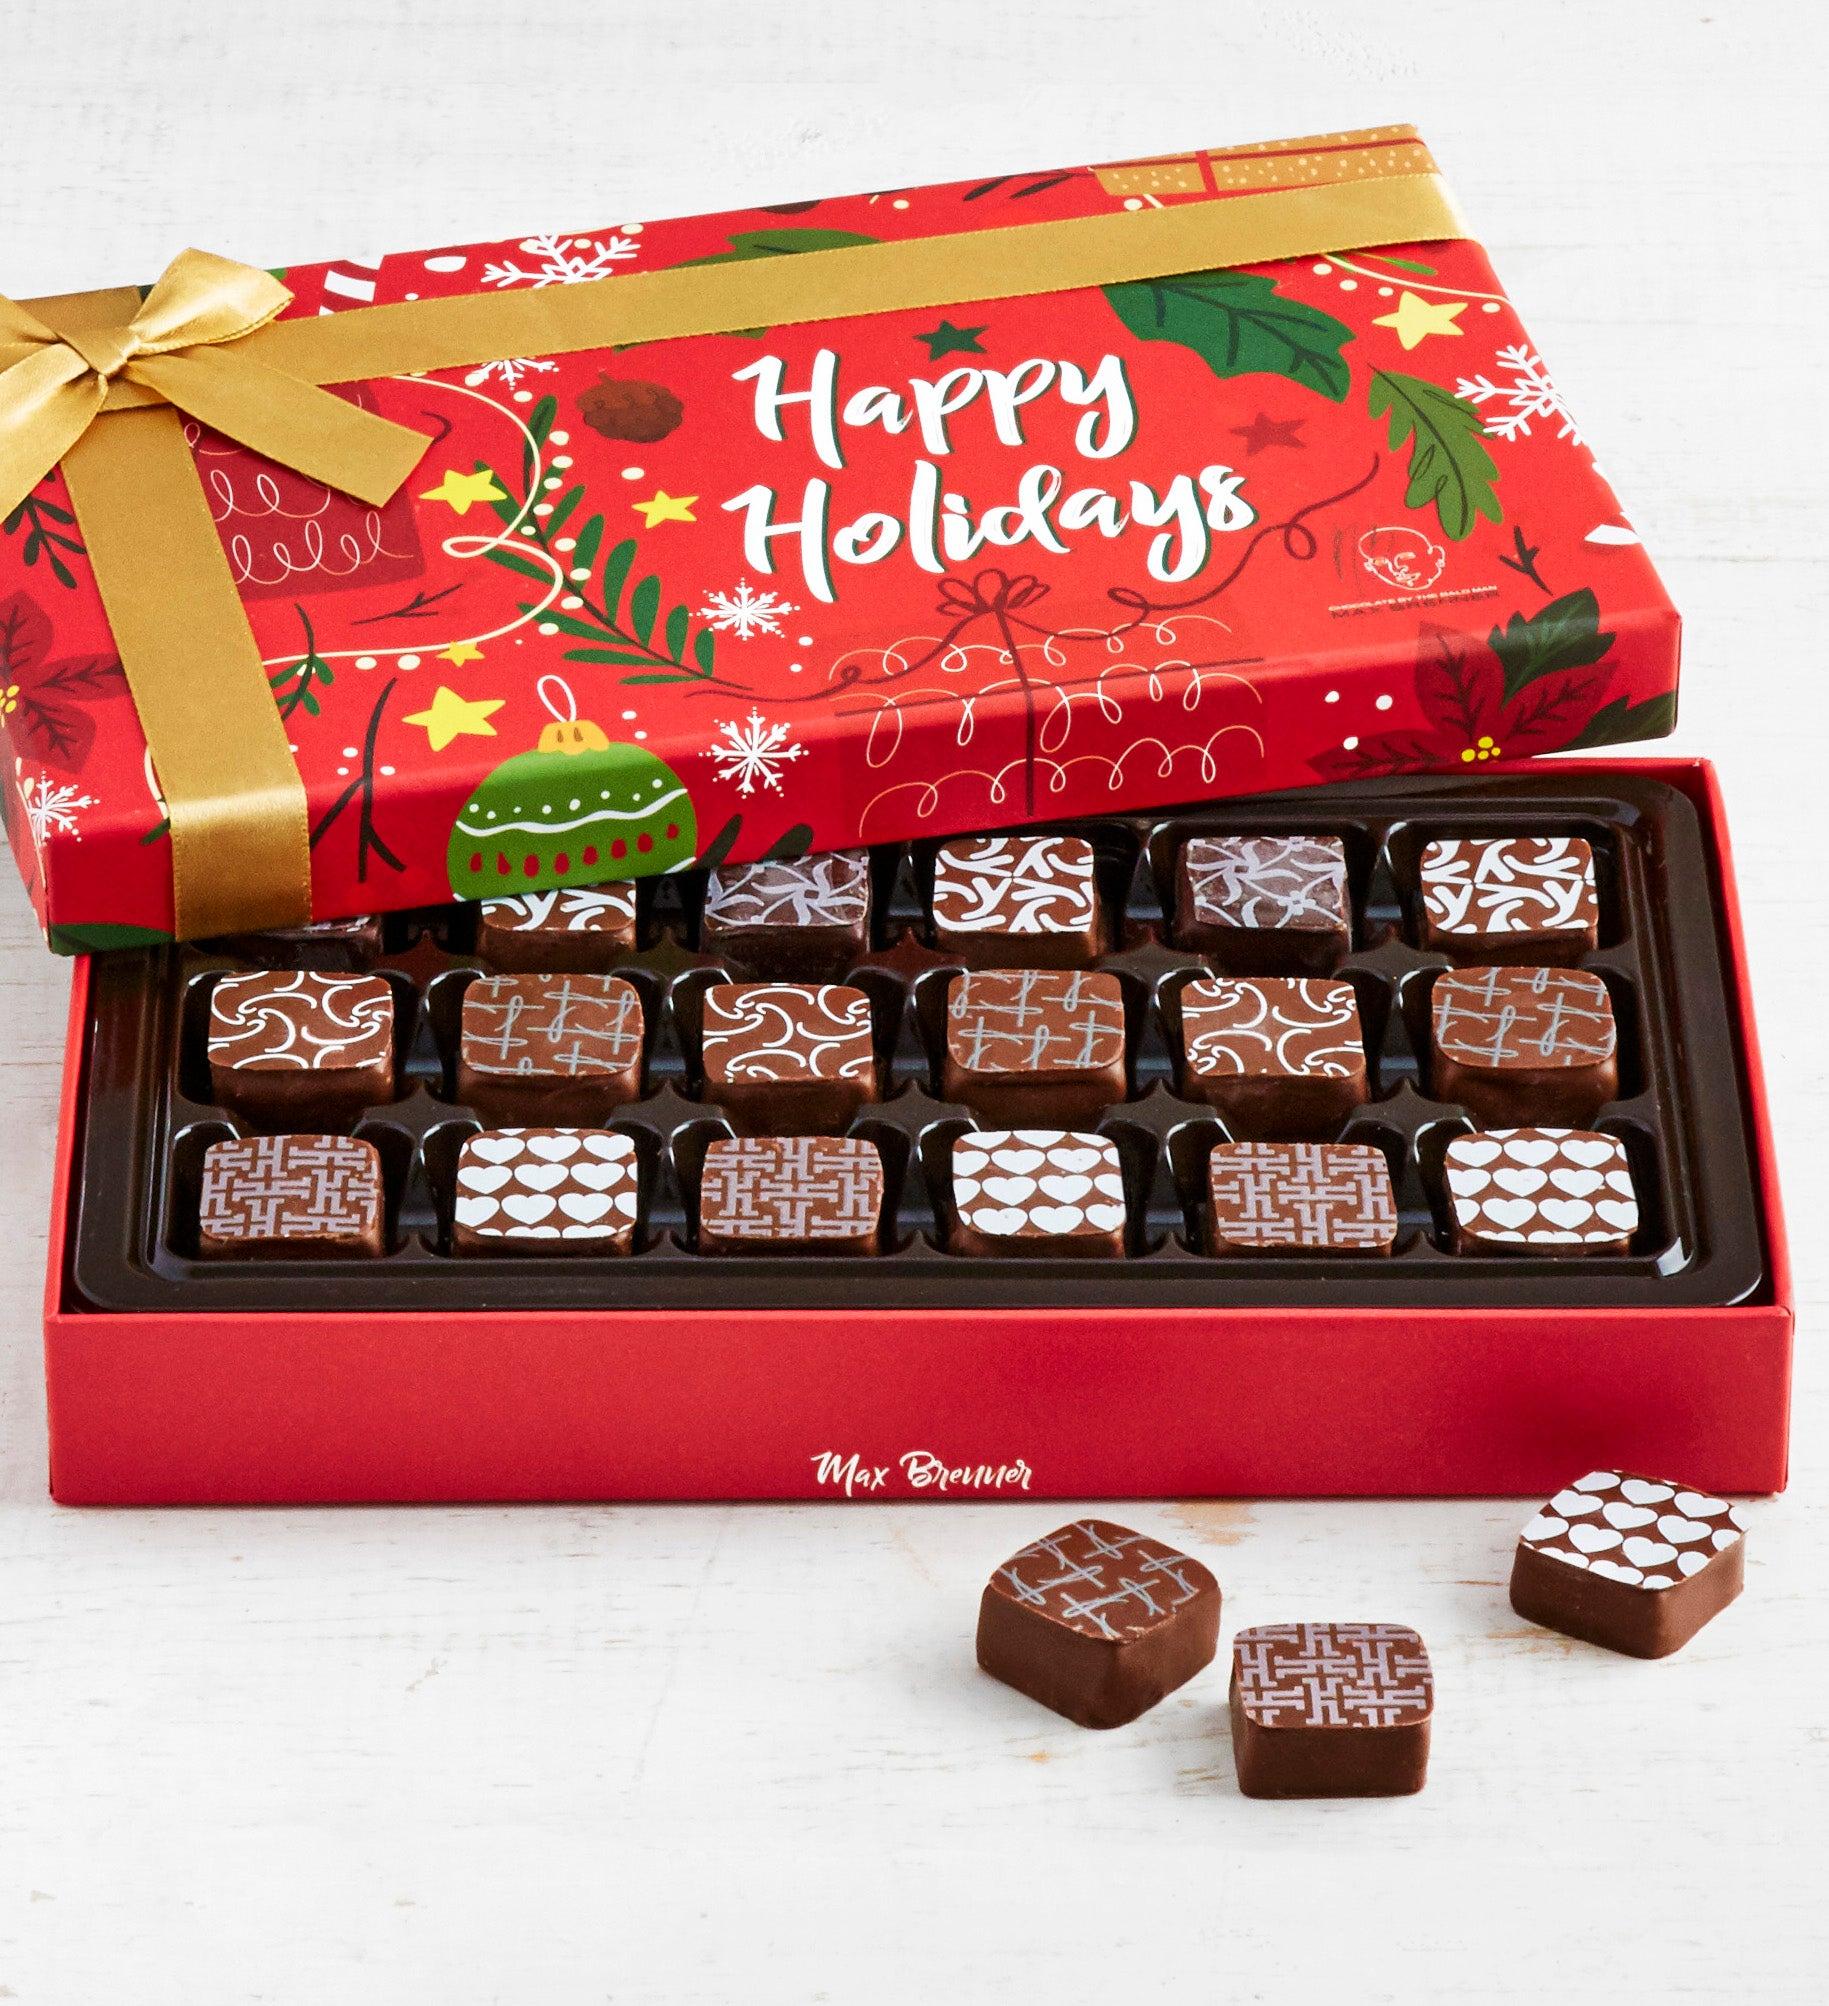 Max Brenner  Pc Holiday Chocolate Bon Bon Box